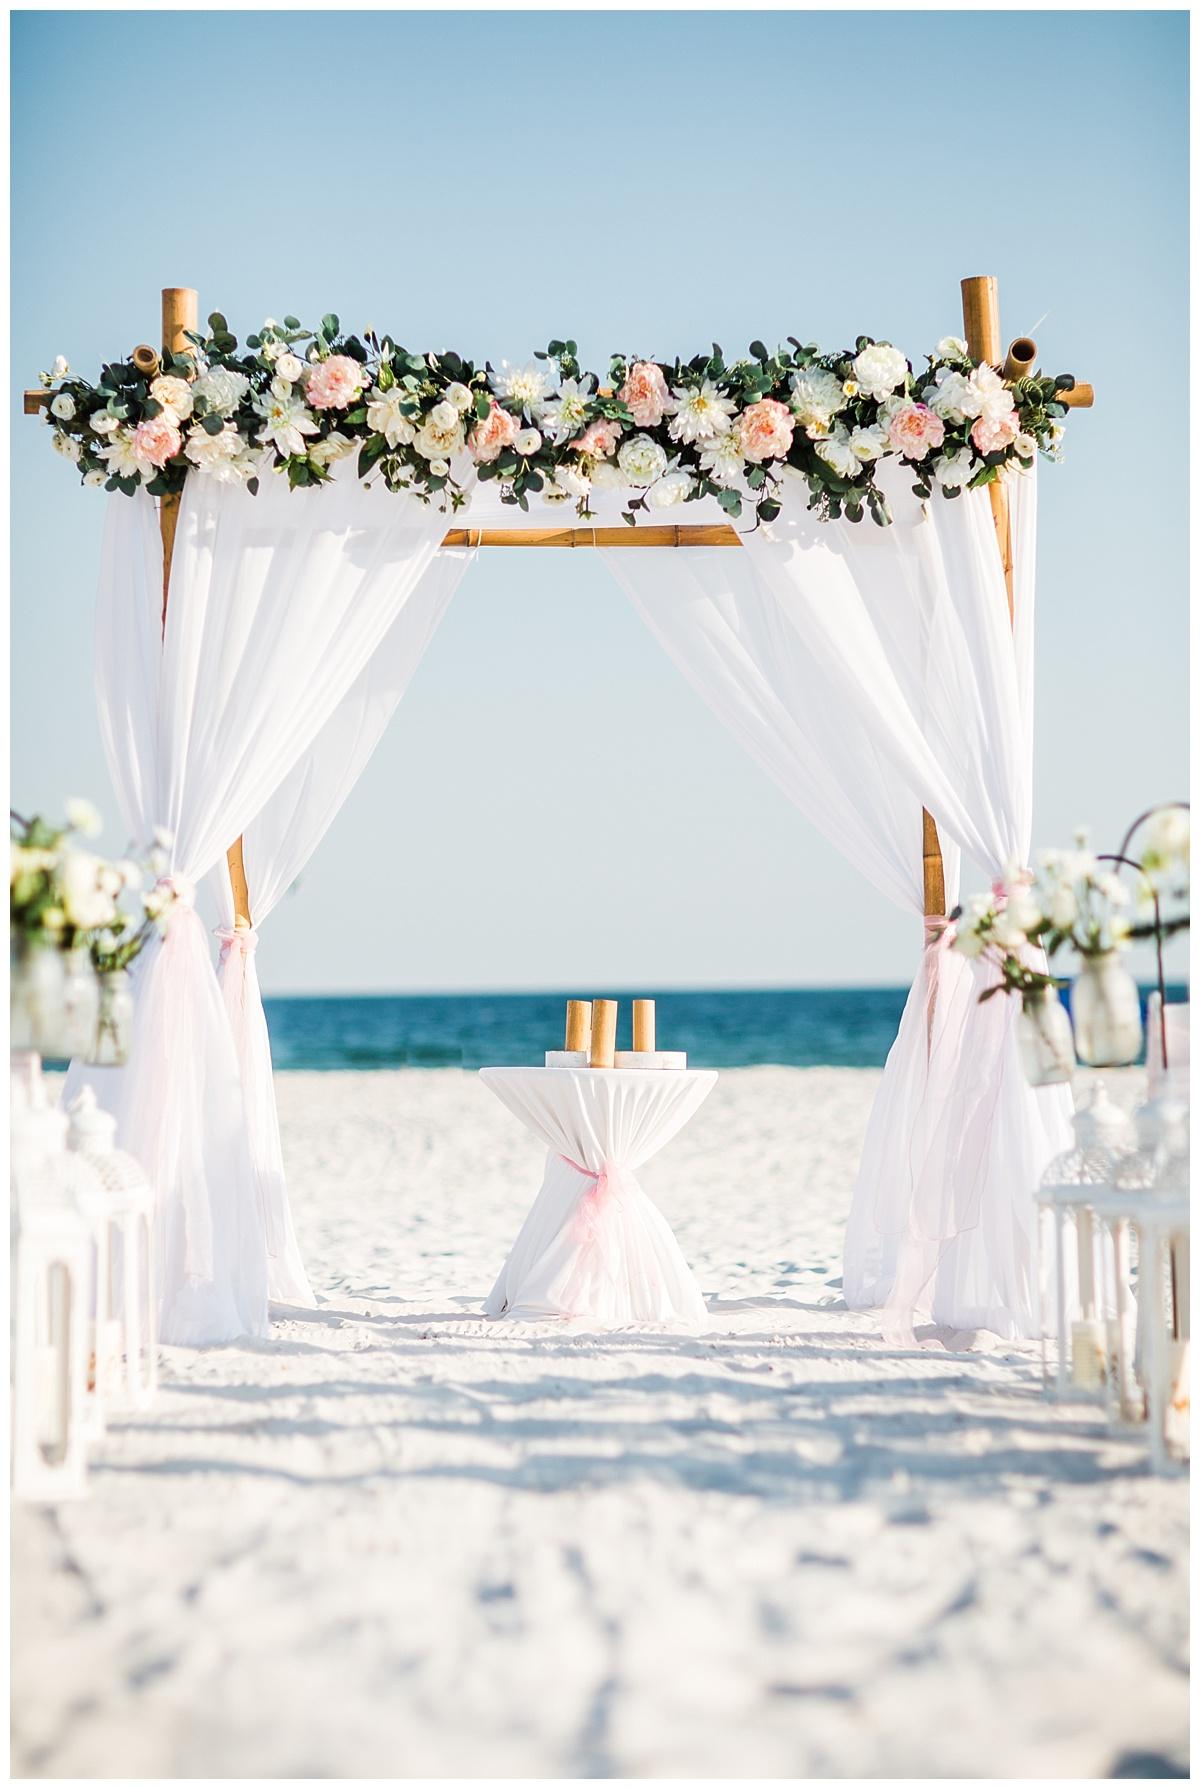 Romantic Wedding Set Up